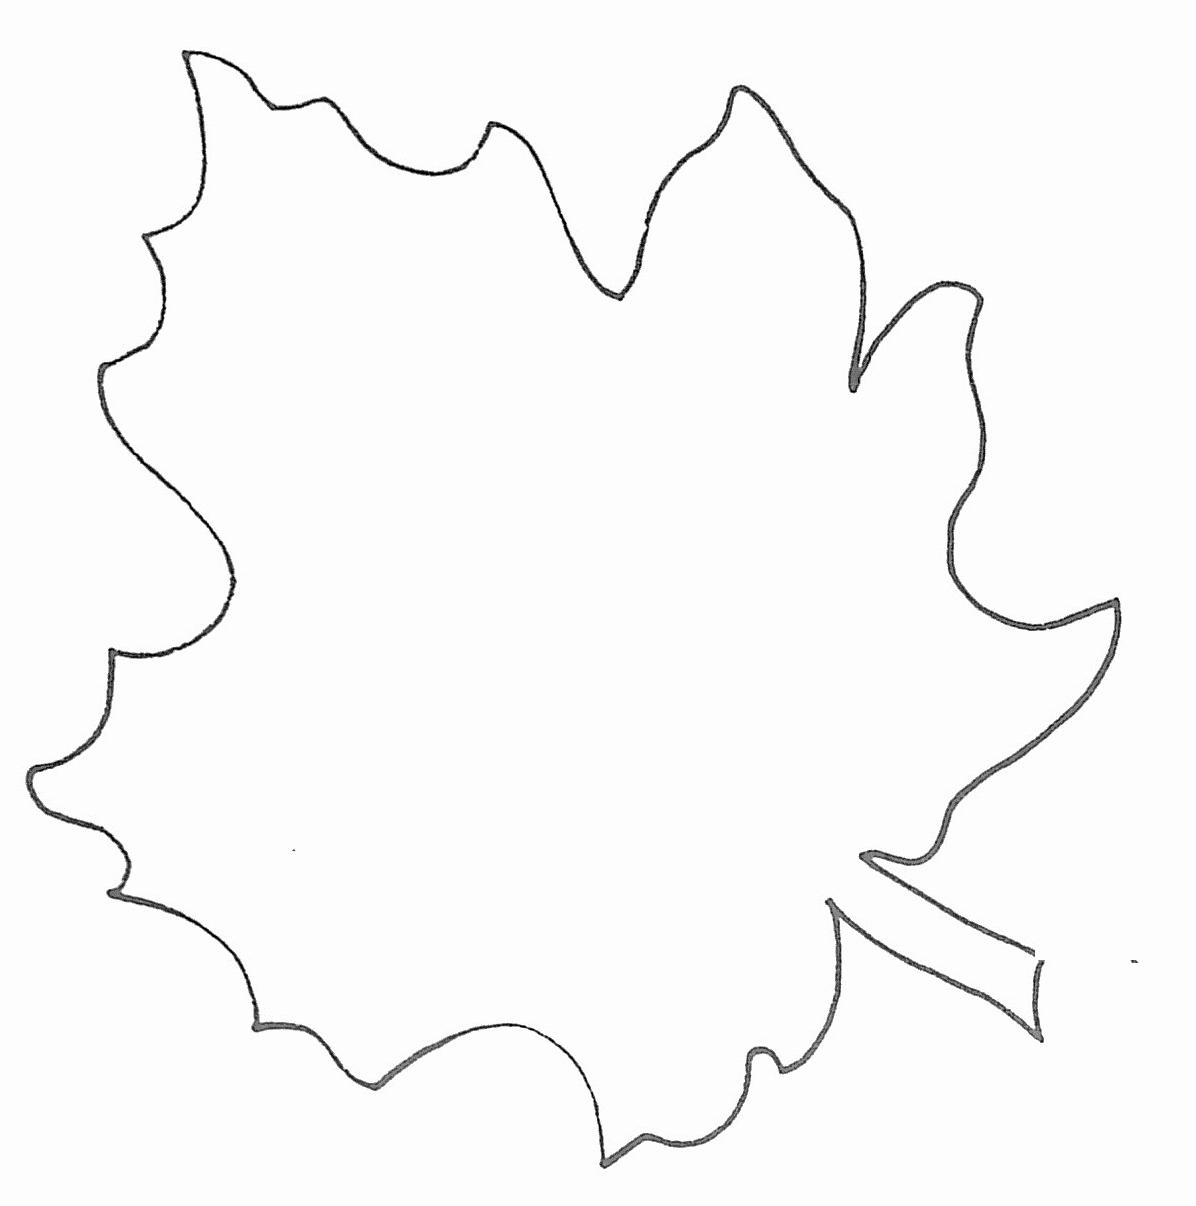 Free Printable Leaf Template   Mathosproject - Free Printable Leaf Template